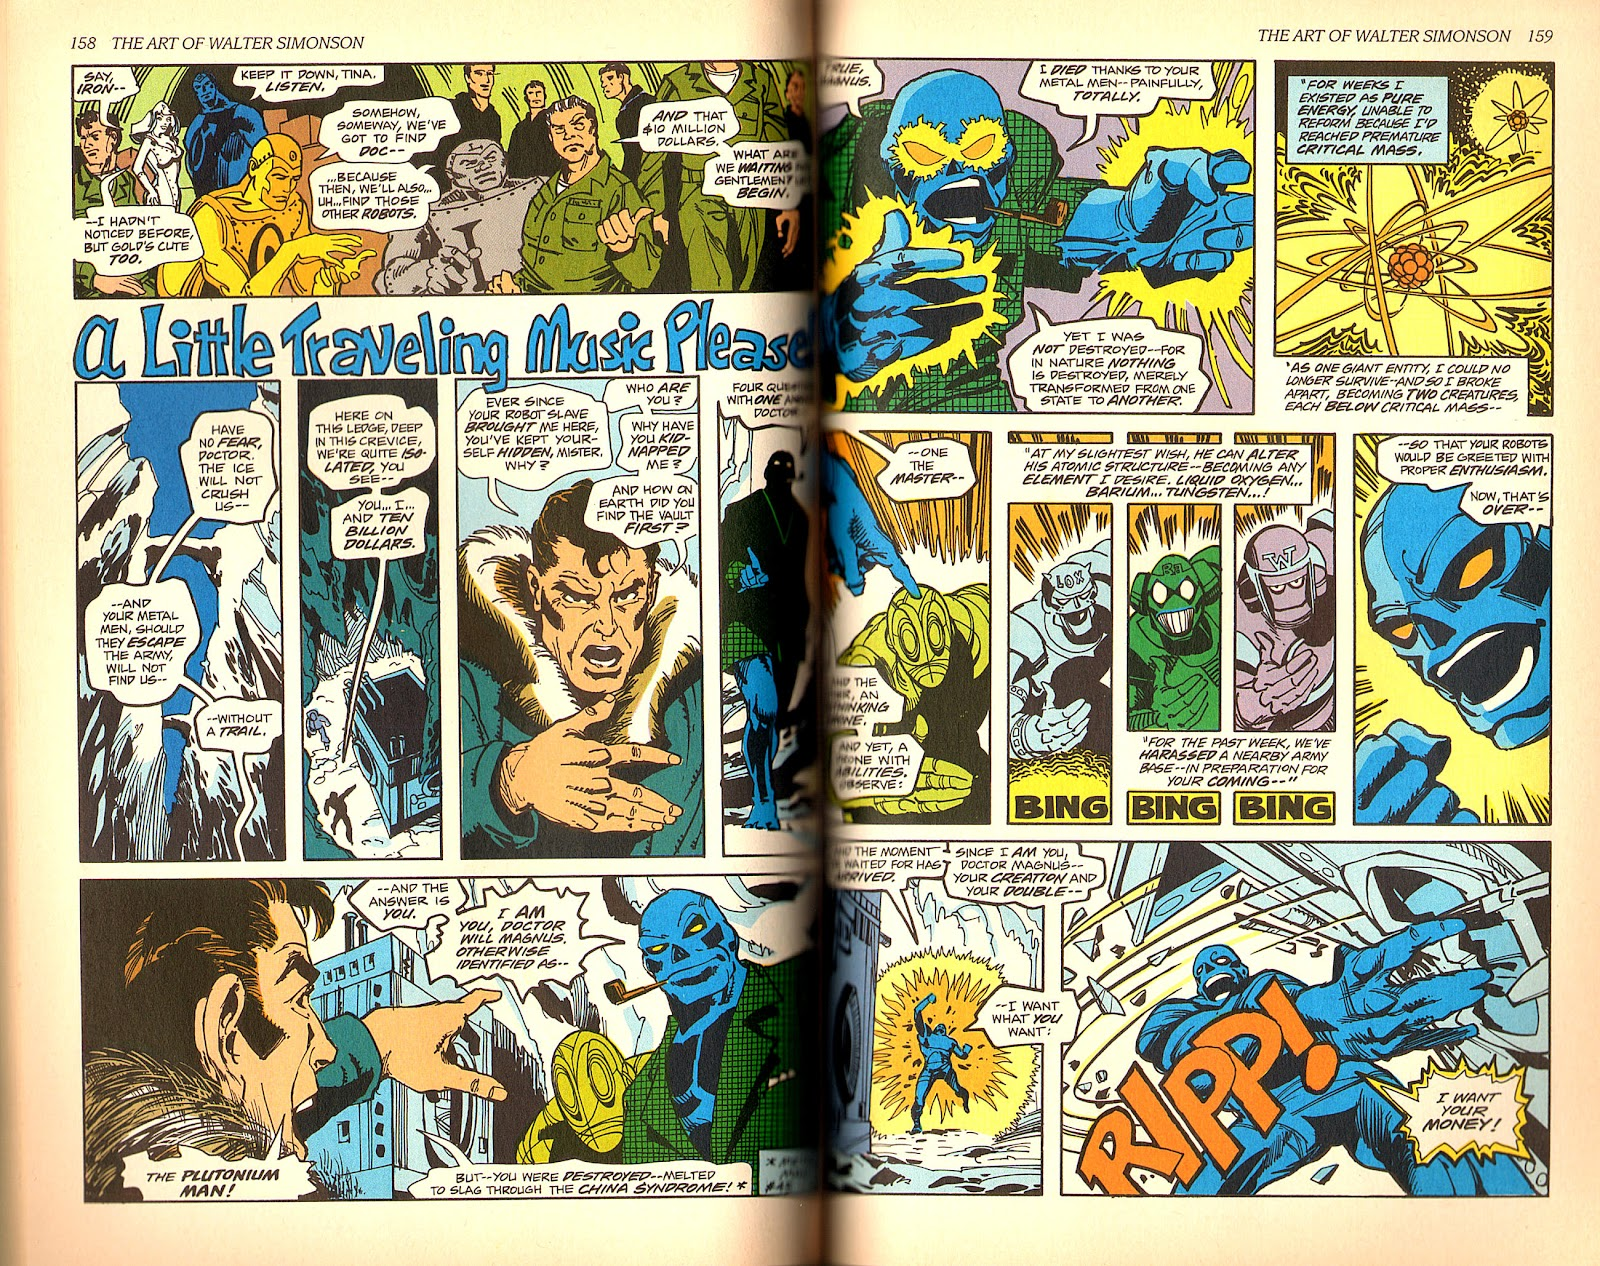 Read online The Art of Walter Simonson comic -  Issue # TPB - 81